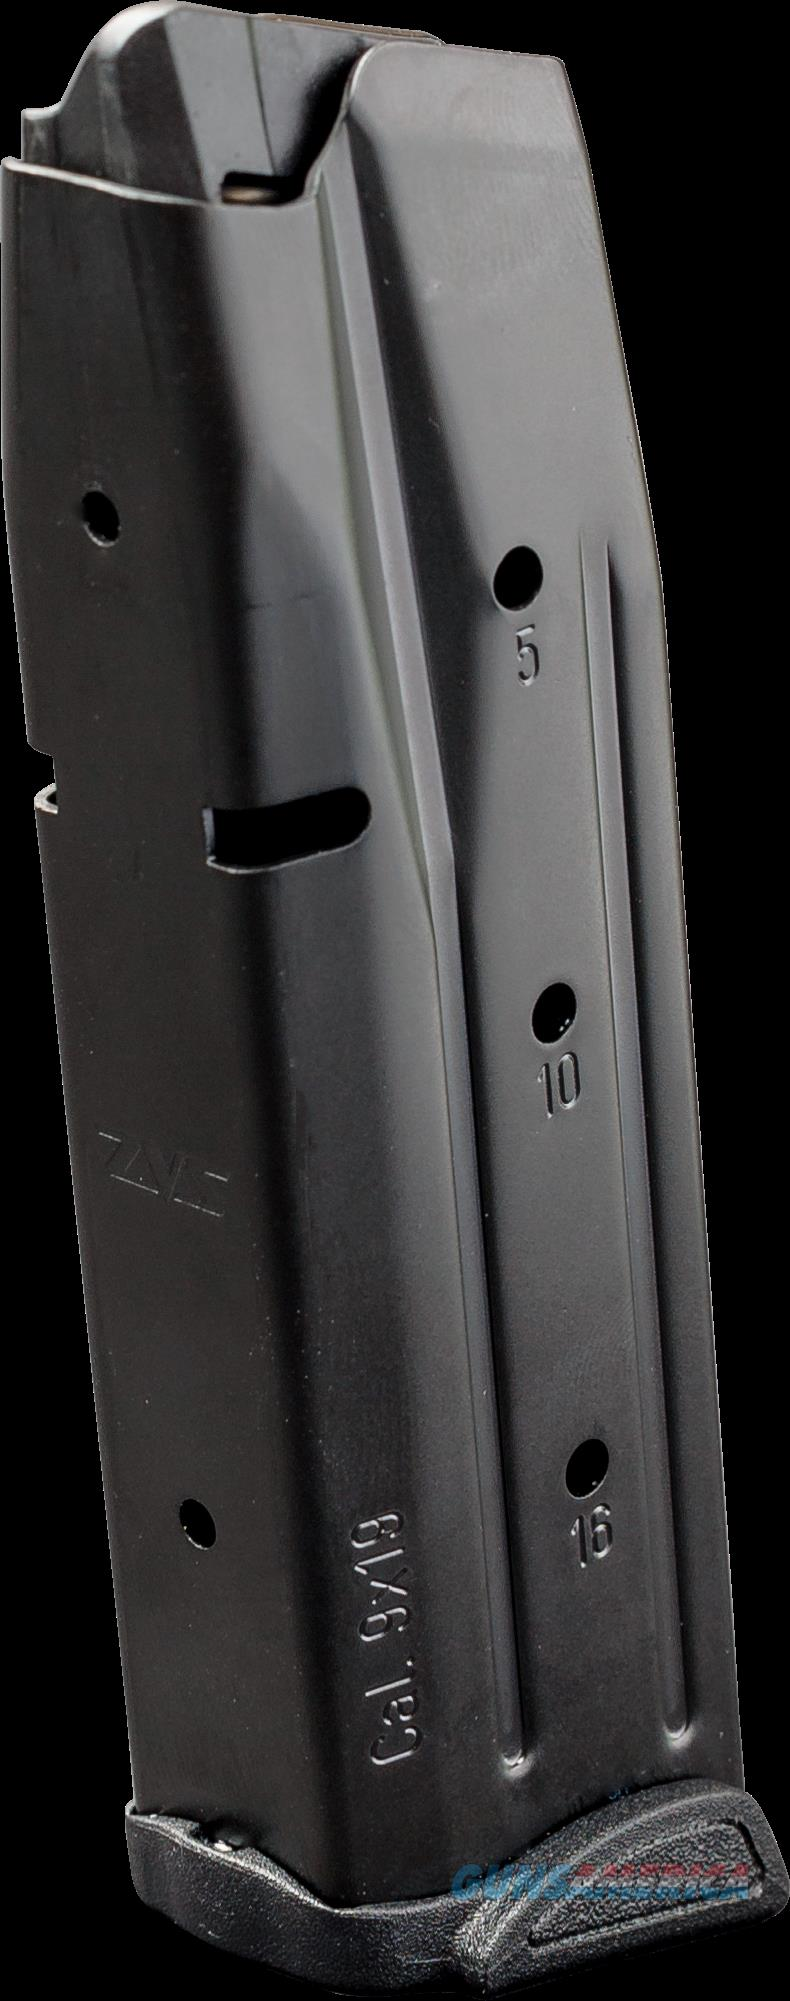 Armscor Z21, Rocki 42318        Ria-mag Z21  9mm           16rd  Guns > Pistols > 1911 Pistol Copies (non-Colt)